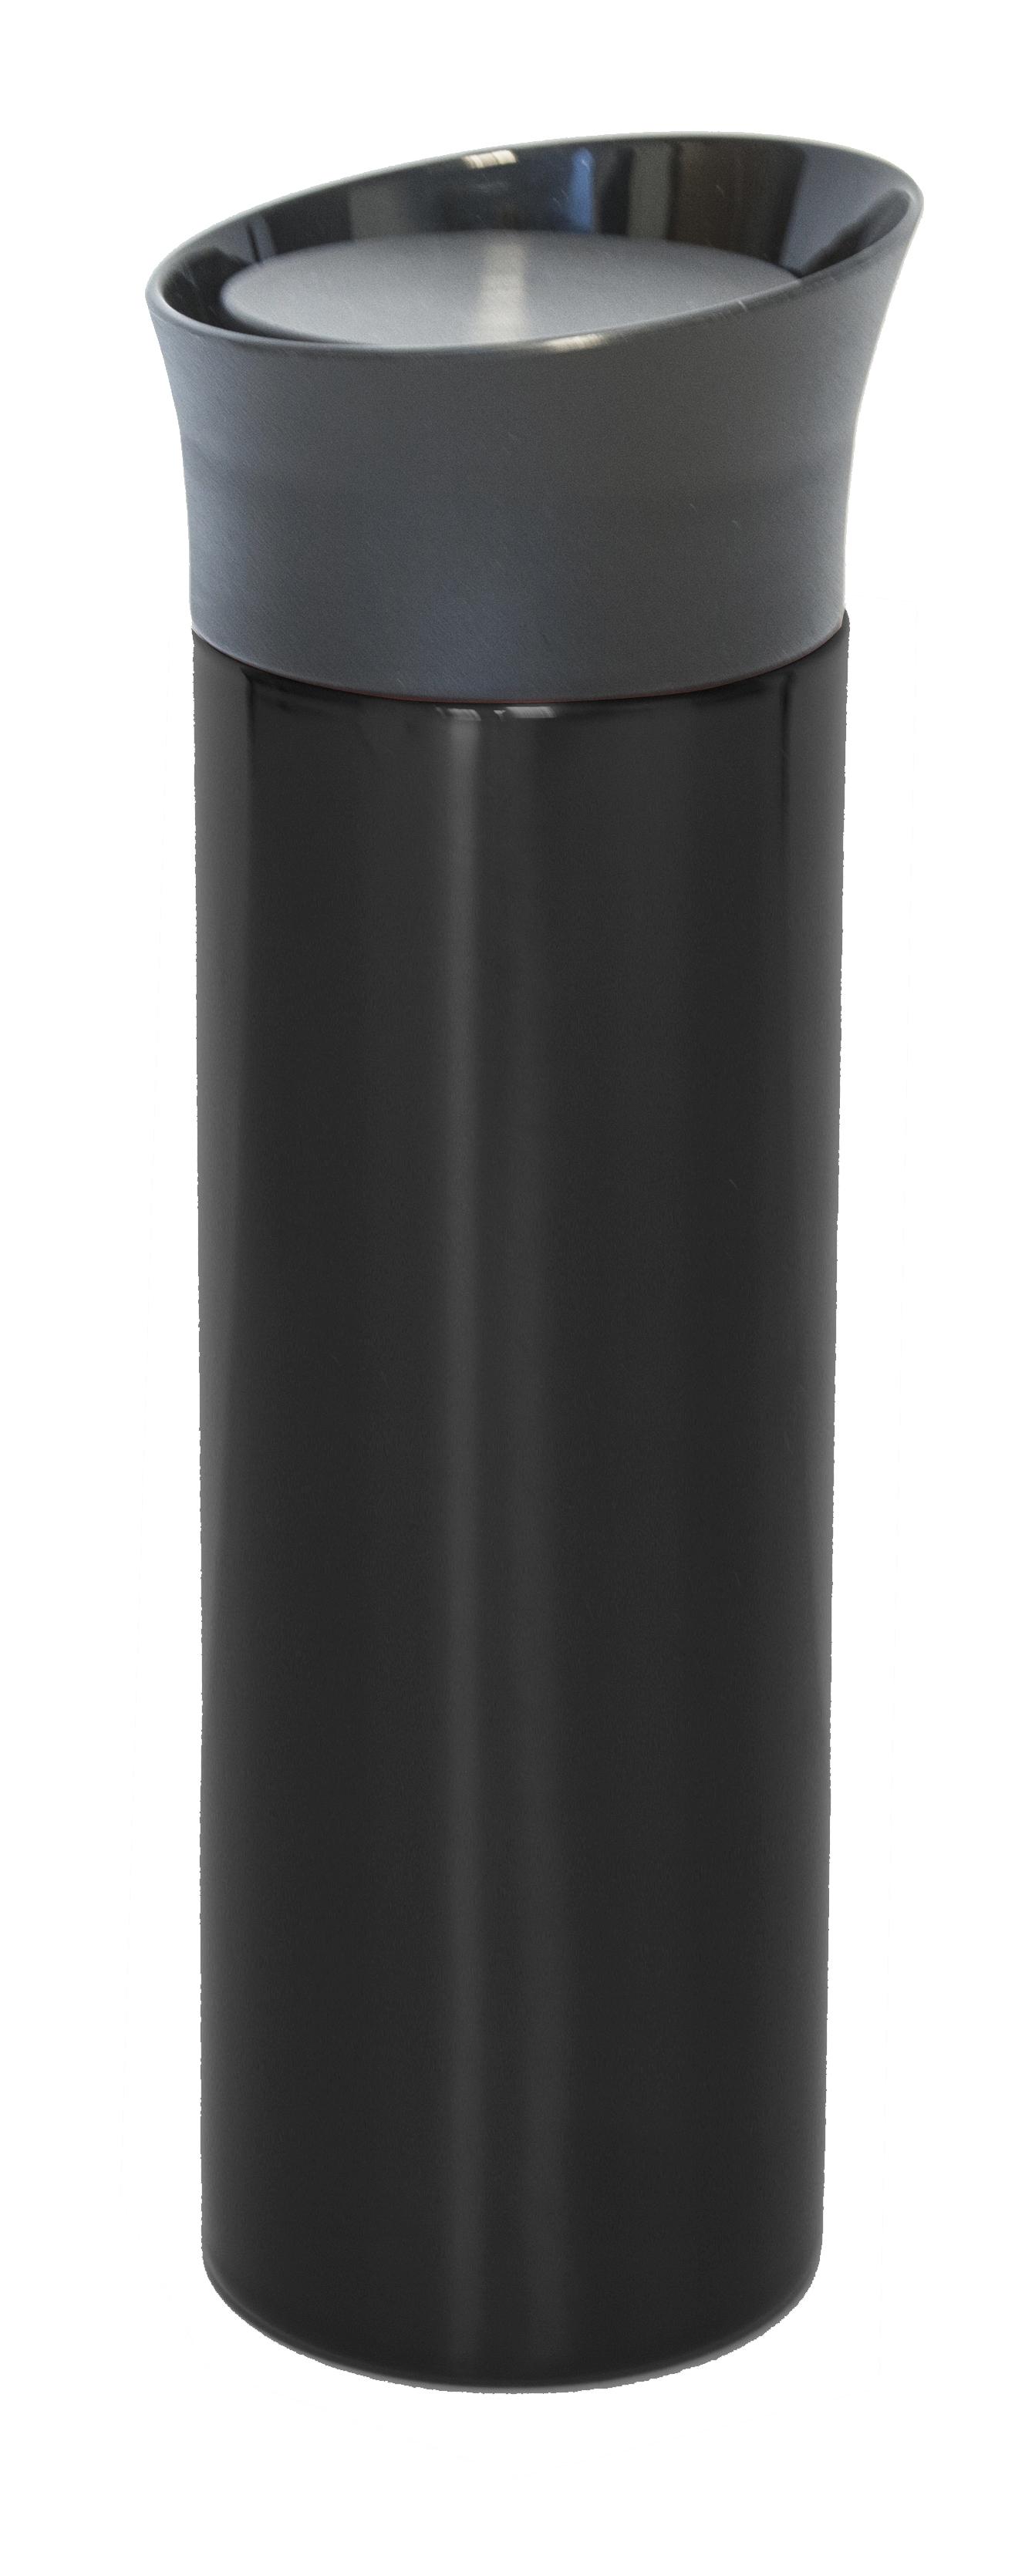 Bilmugg rak stor, svart